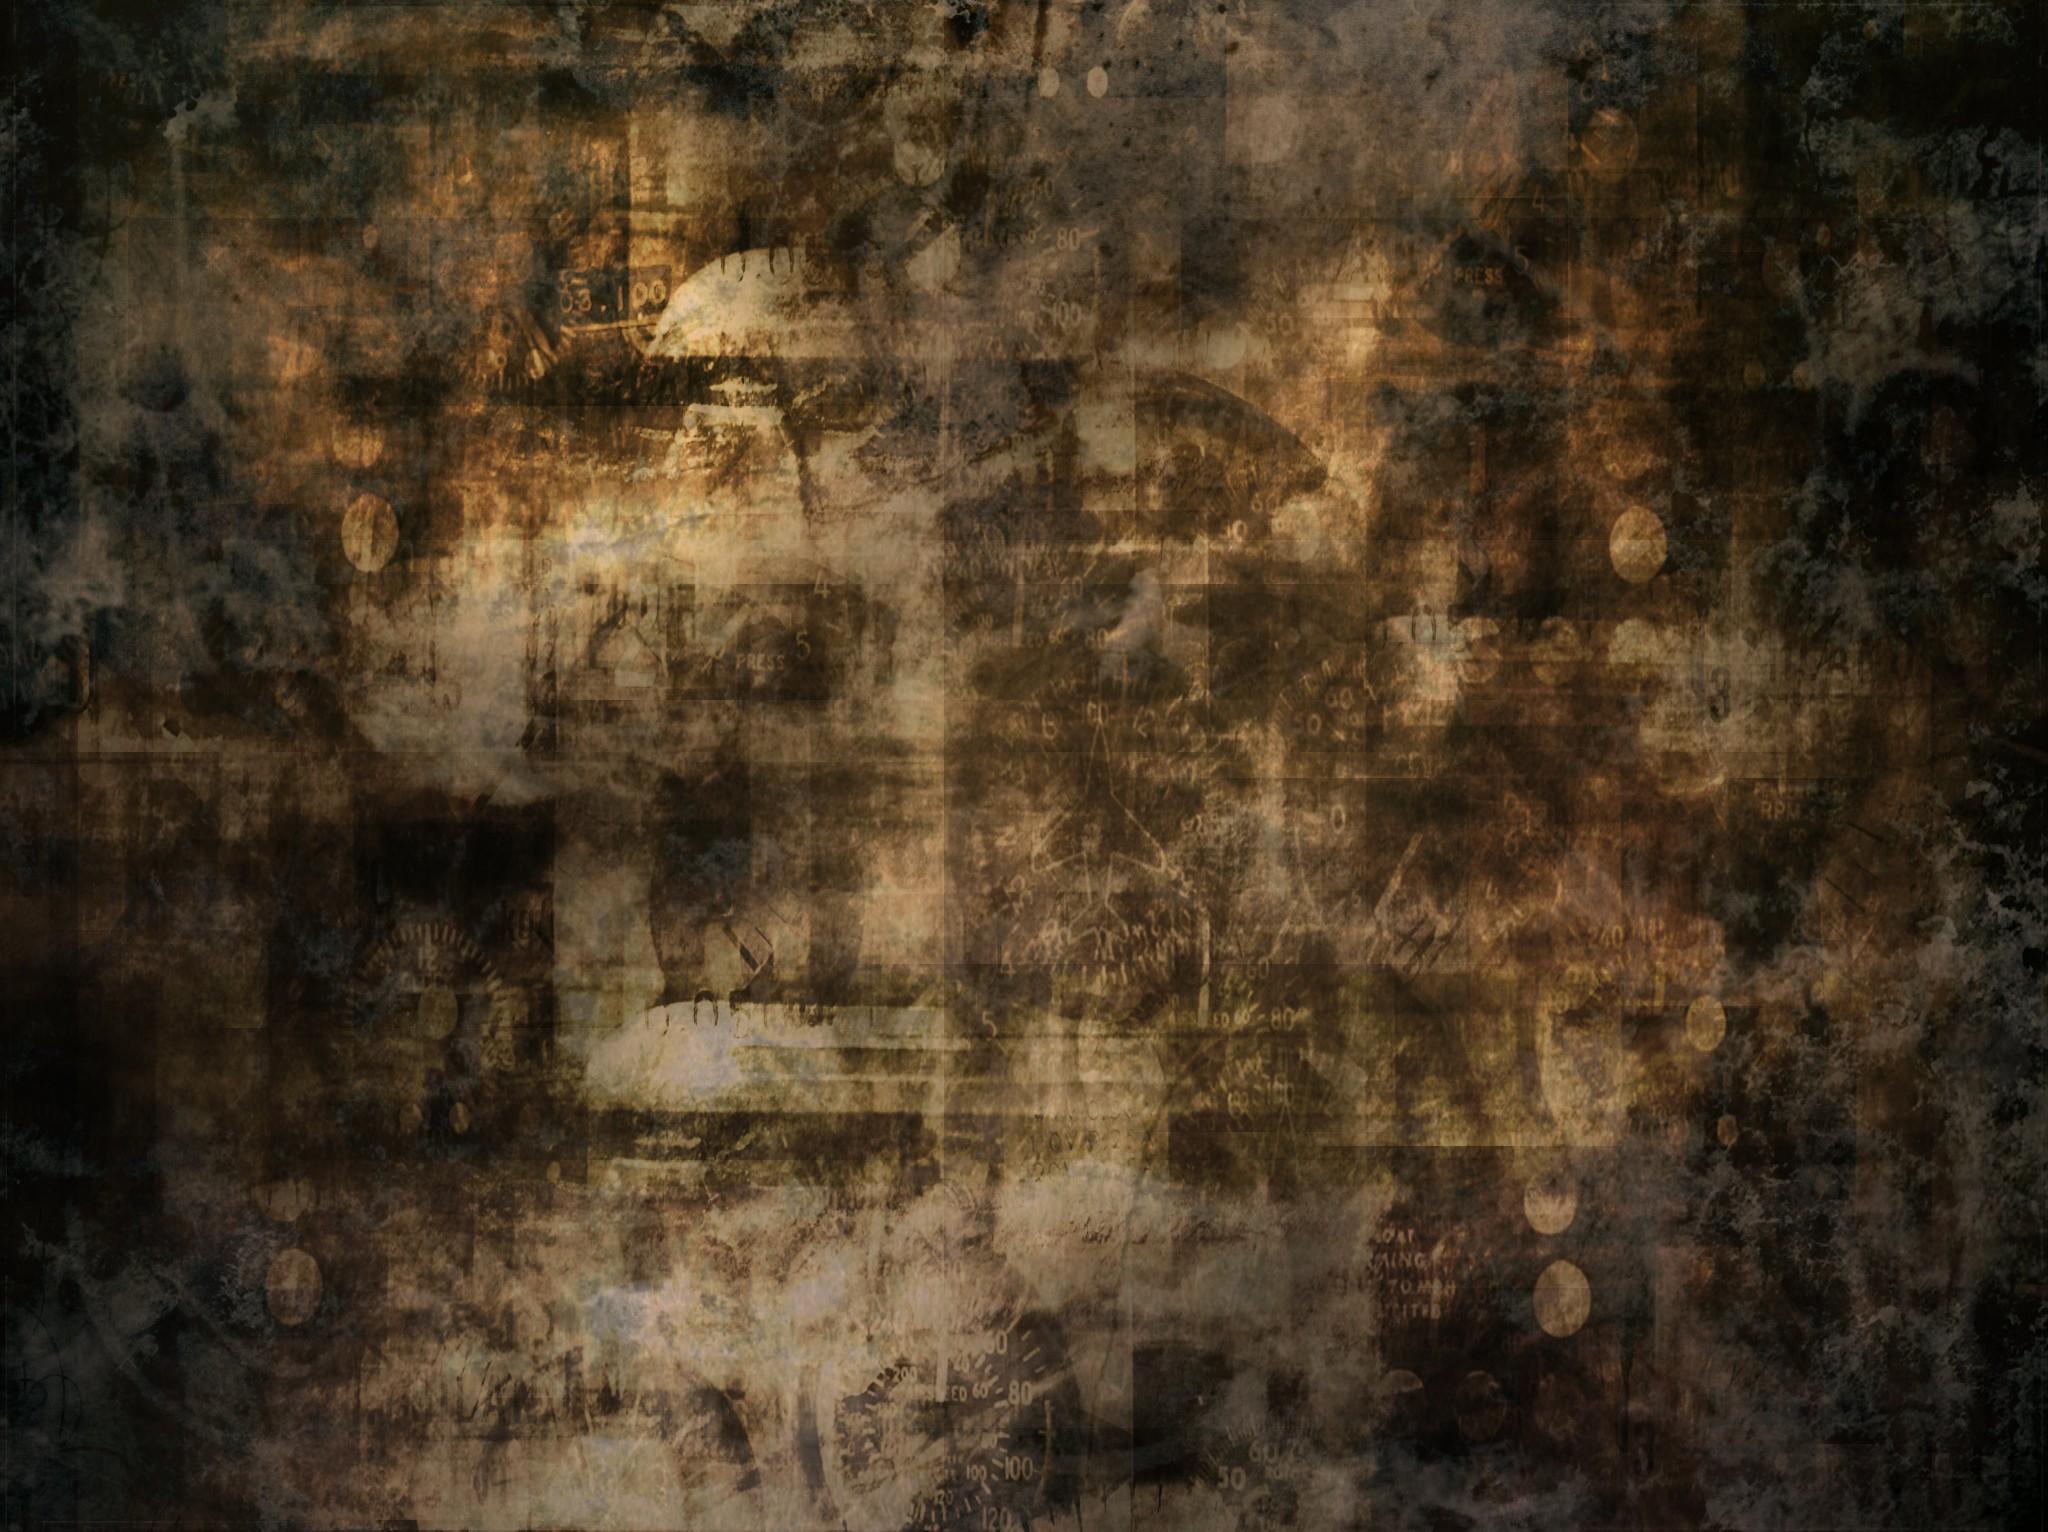 Download Grunge Textures Wallpaper 2048x1532 Wallpoper 2048x1532